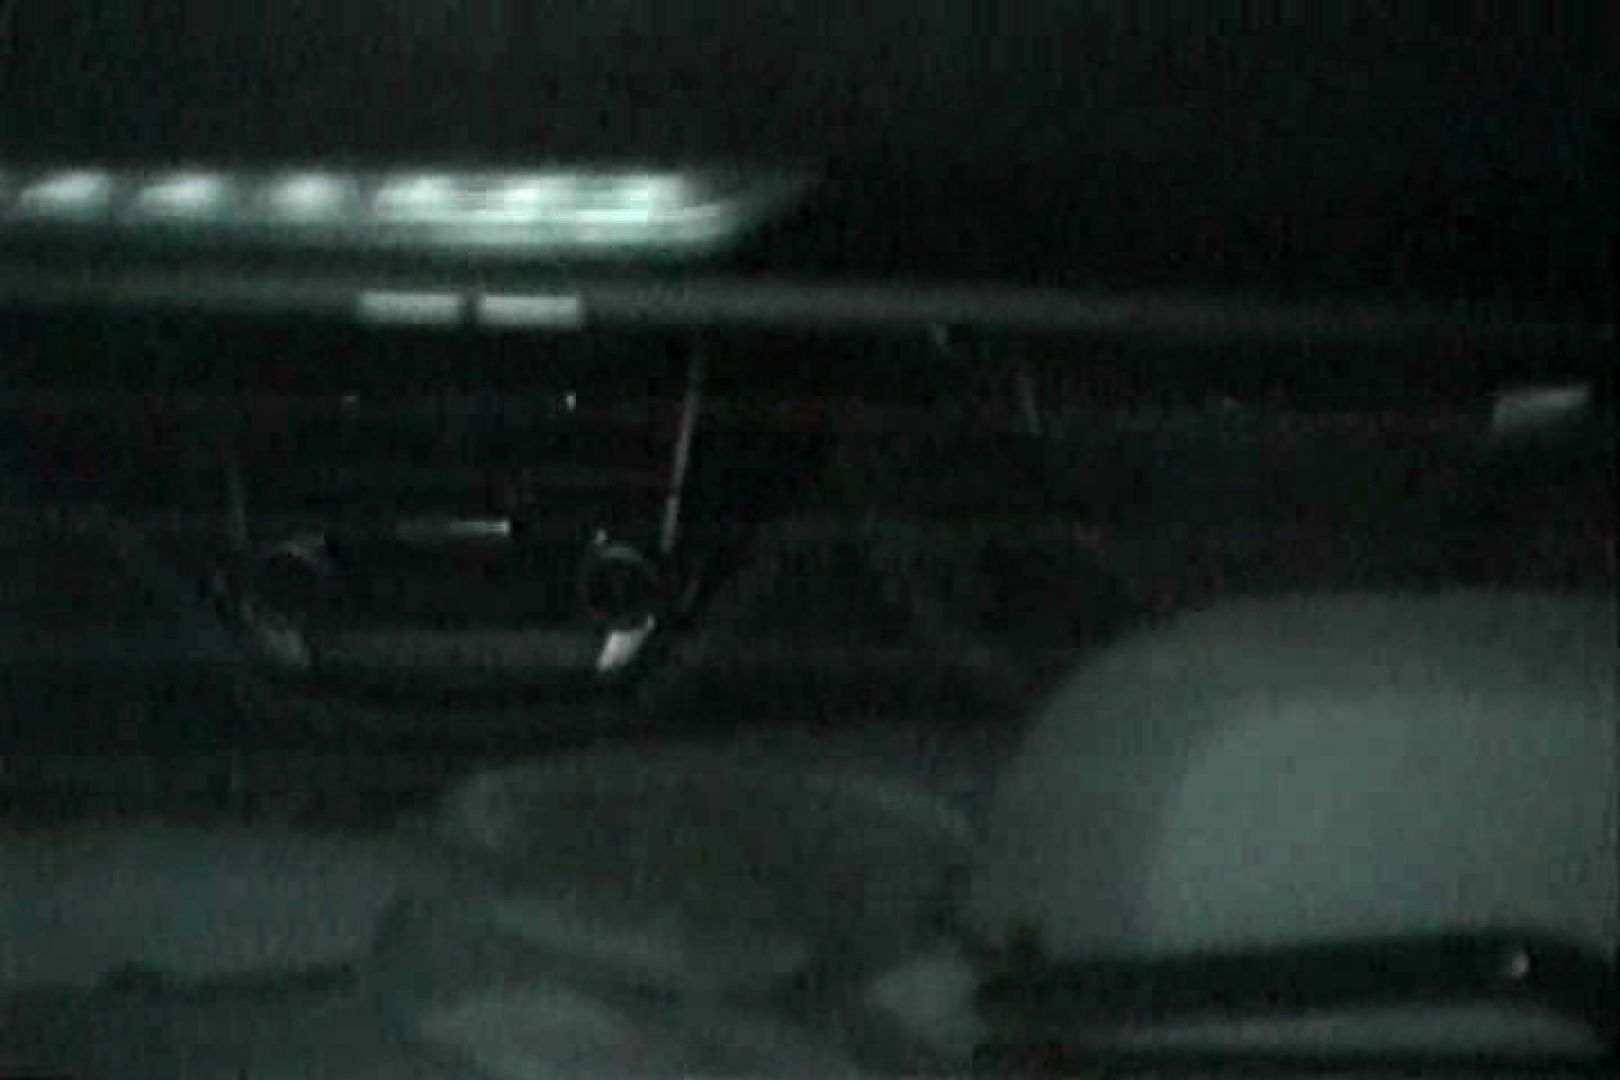 充血監督の深夜の運動会Vol.124 車 オメコ無修正動画無料 63画像 16